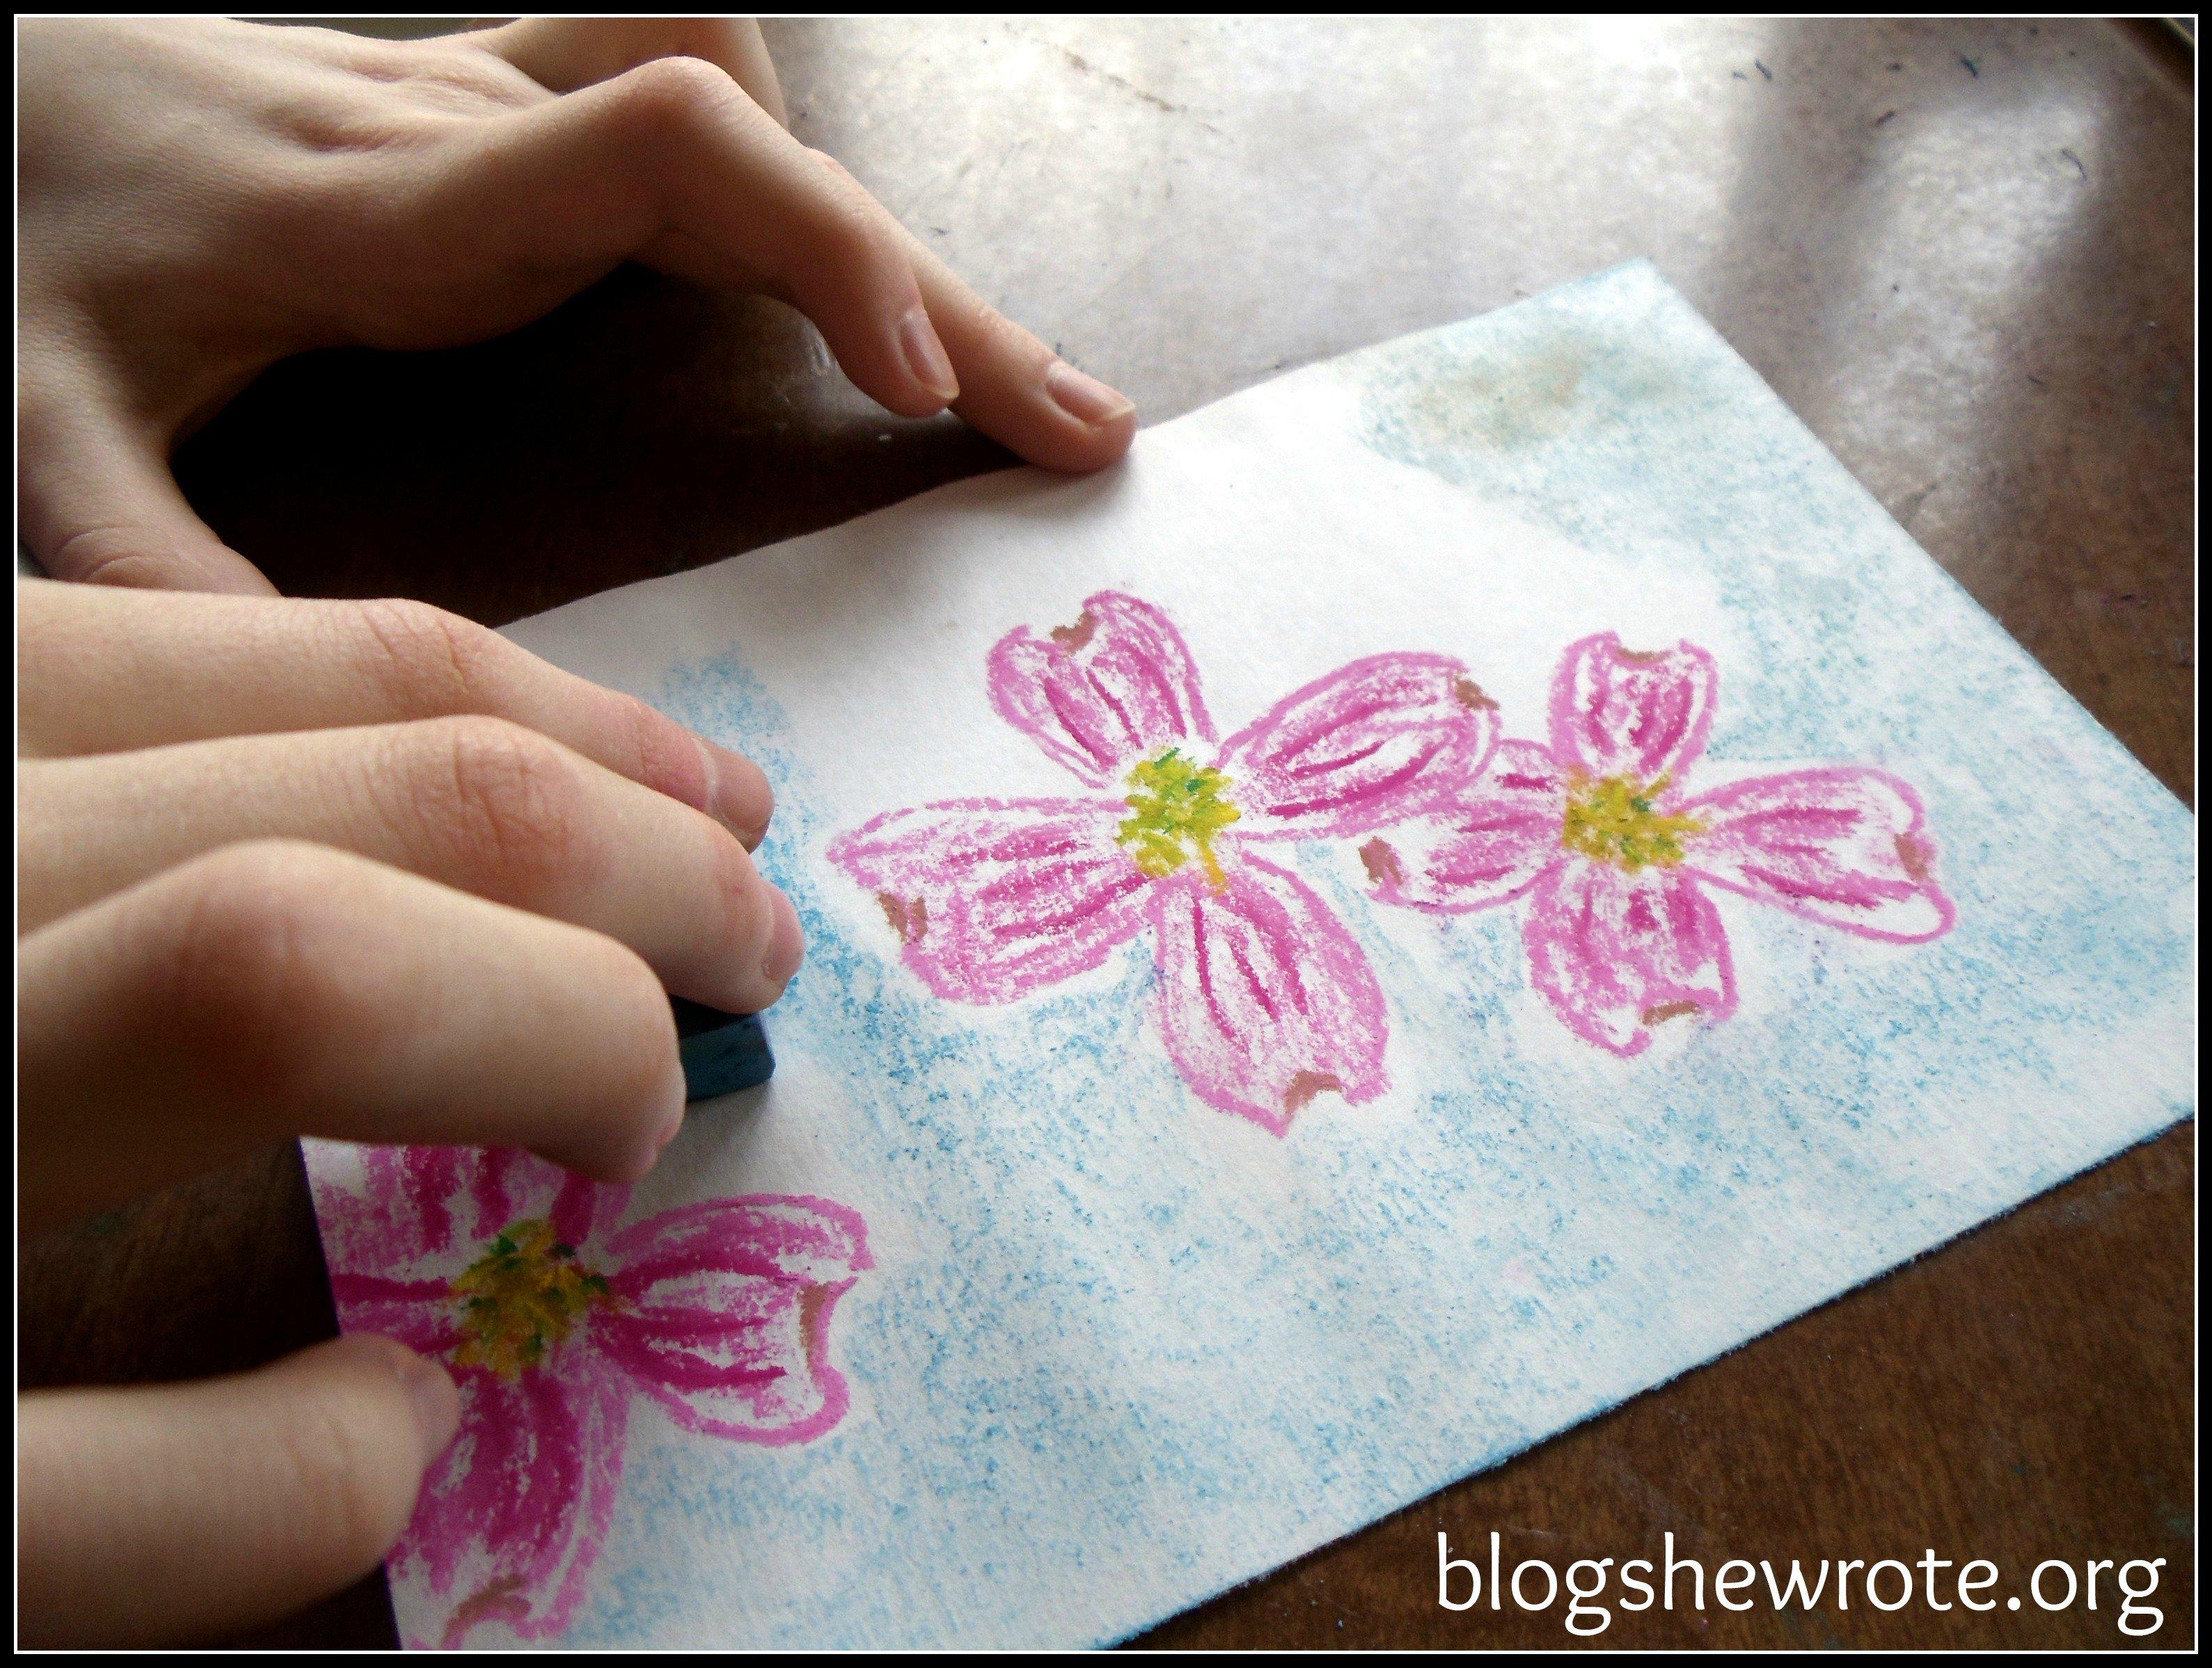 Blog, She Wrote: Homeschooling Middle & High School Fine Arts